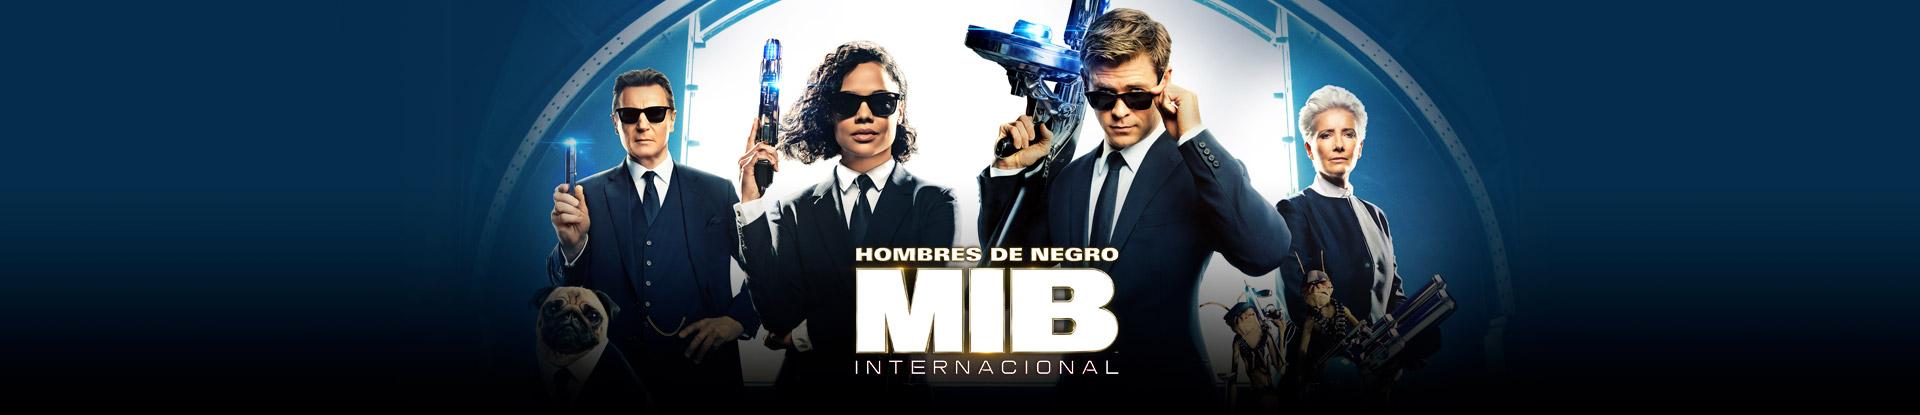 Hombres de Negro Internacional